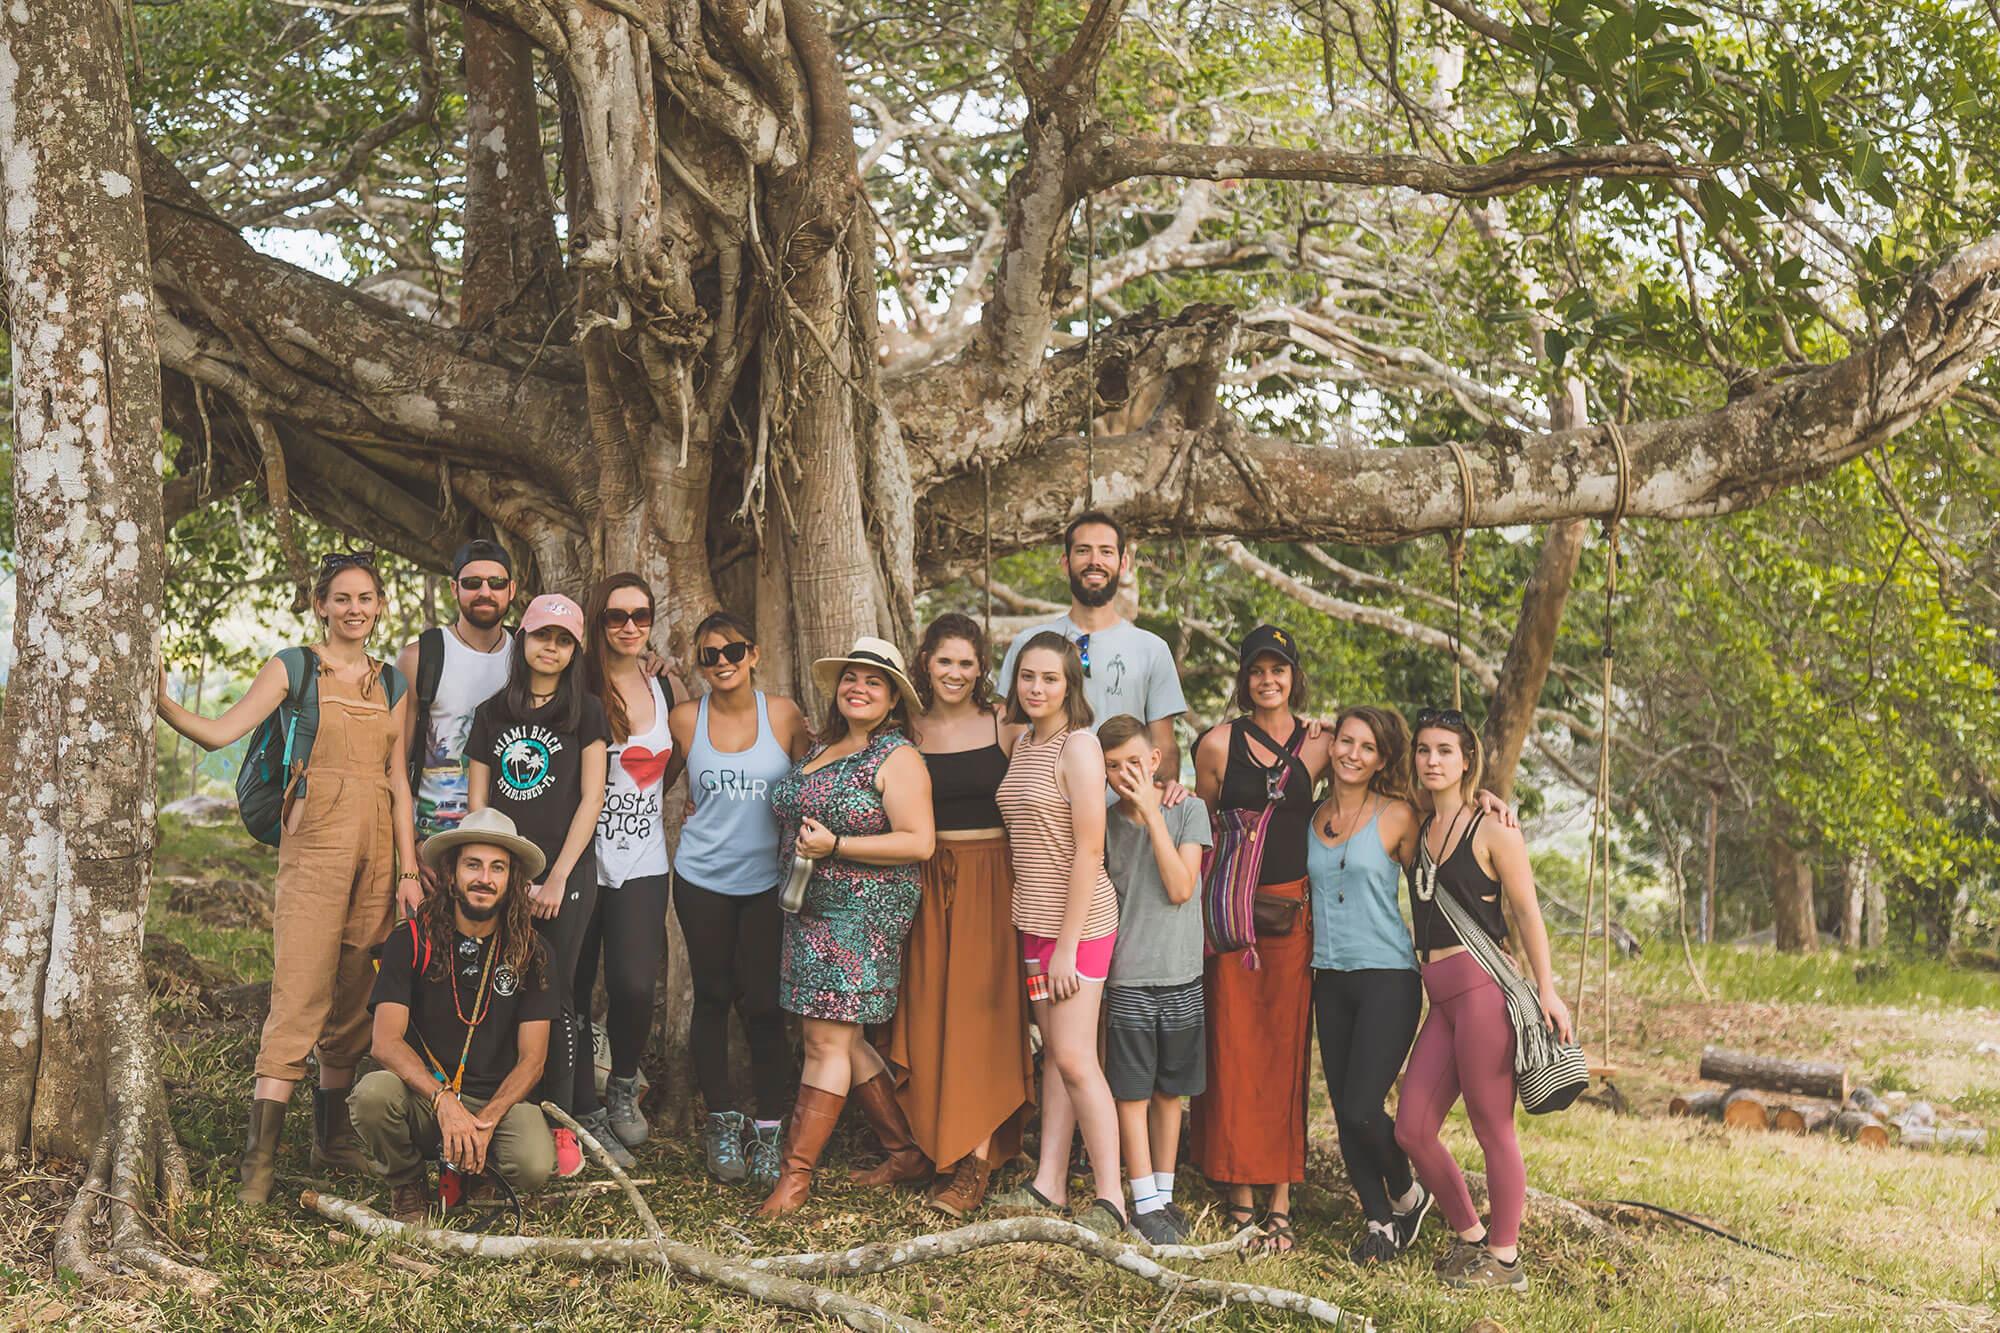 Alegria-farm-tour-group.jpg